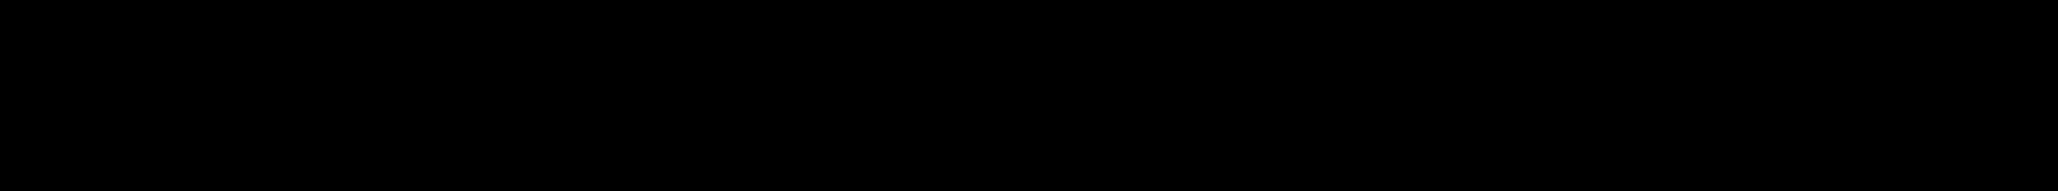 Design System A 300R